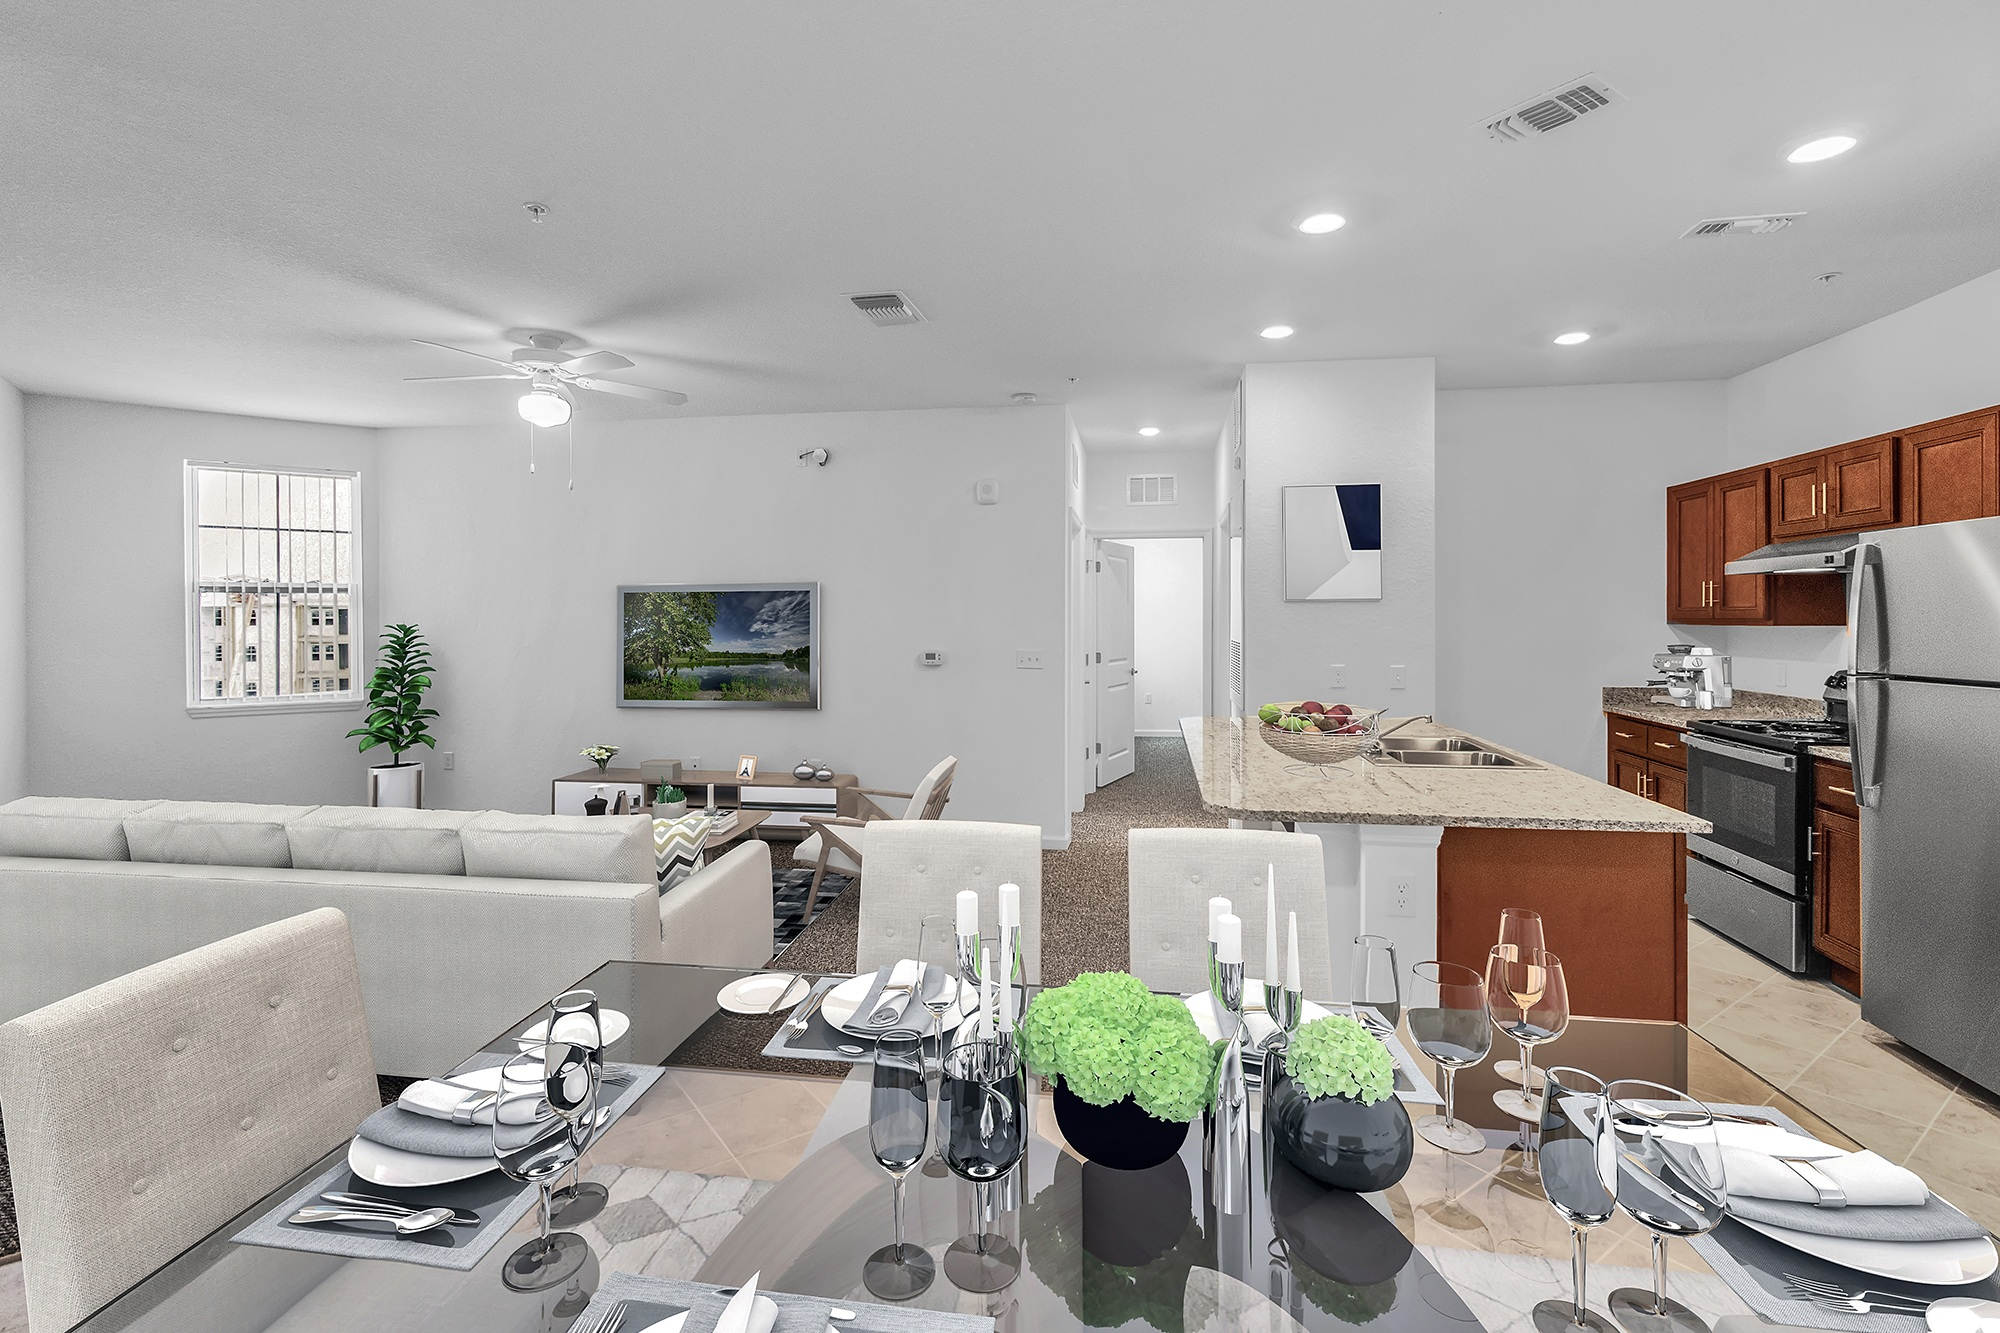 Dining room, living room, kitchen